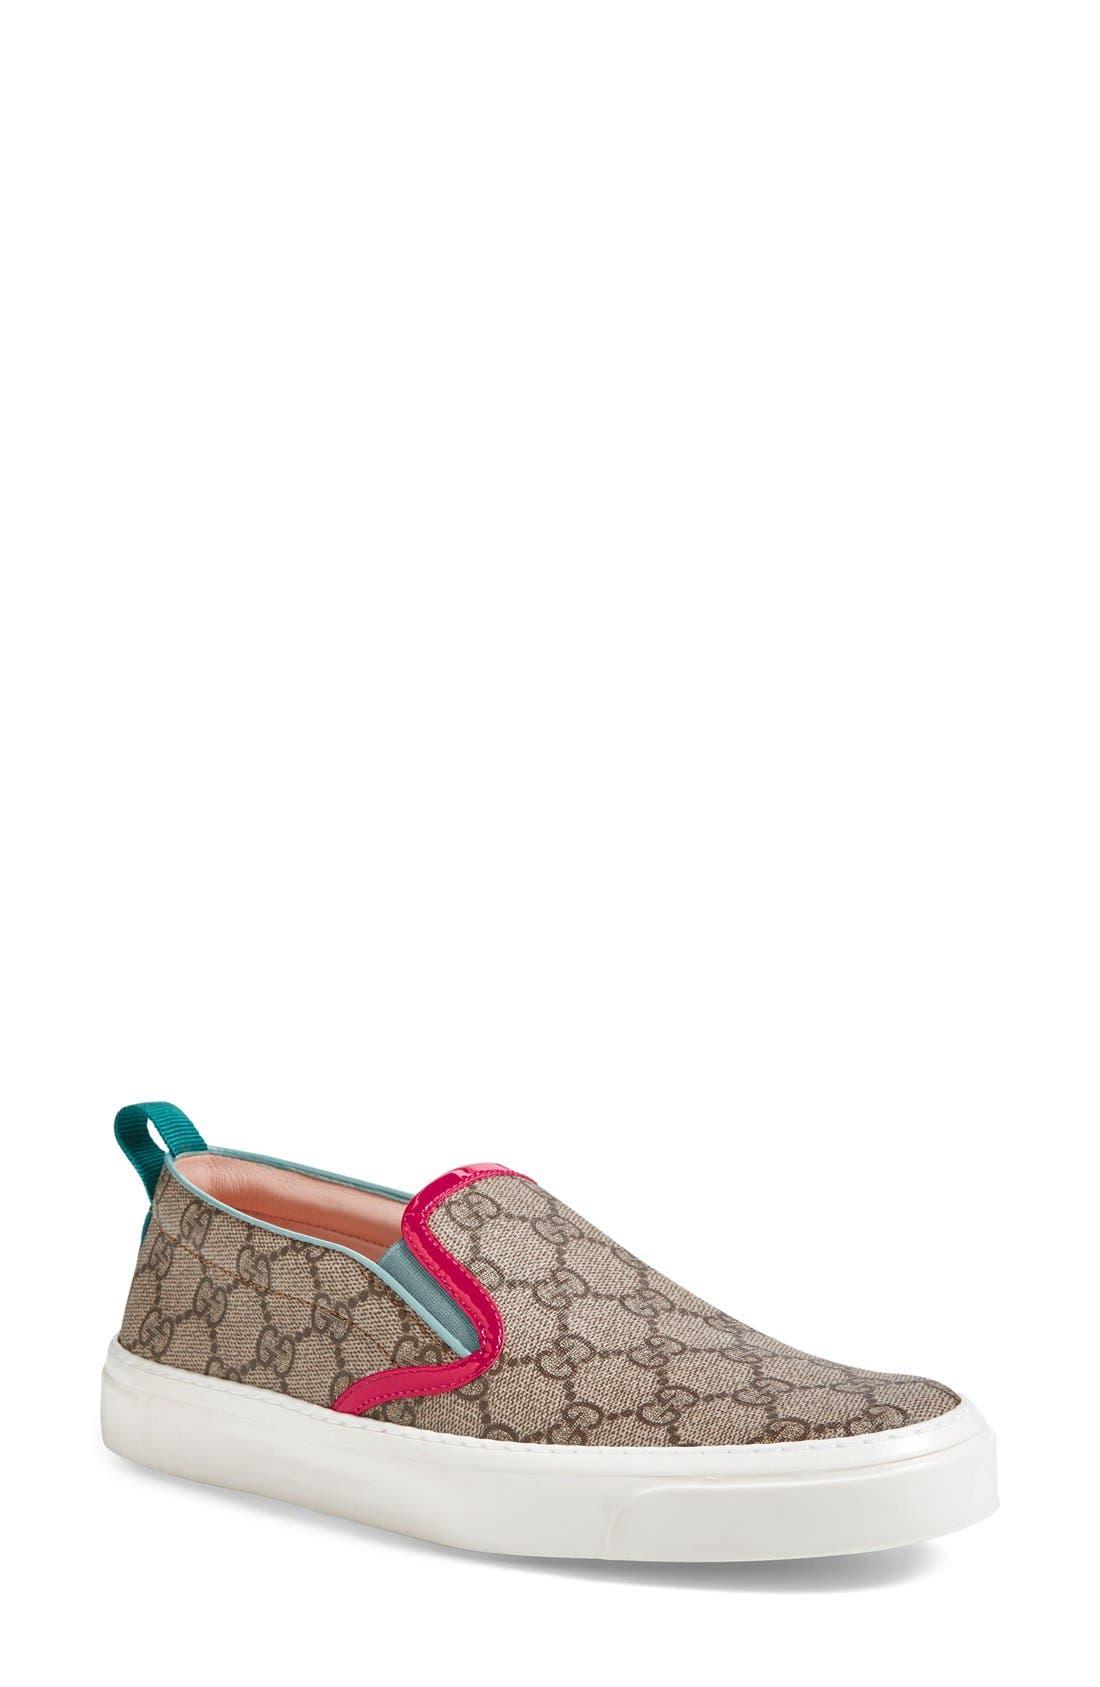 Alternate Image 1 Selected - Gucci 'Board' Skate Slip-On (Women)